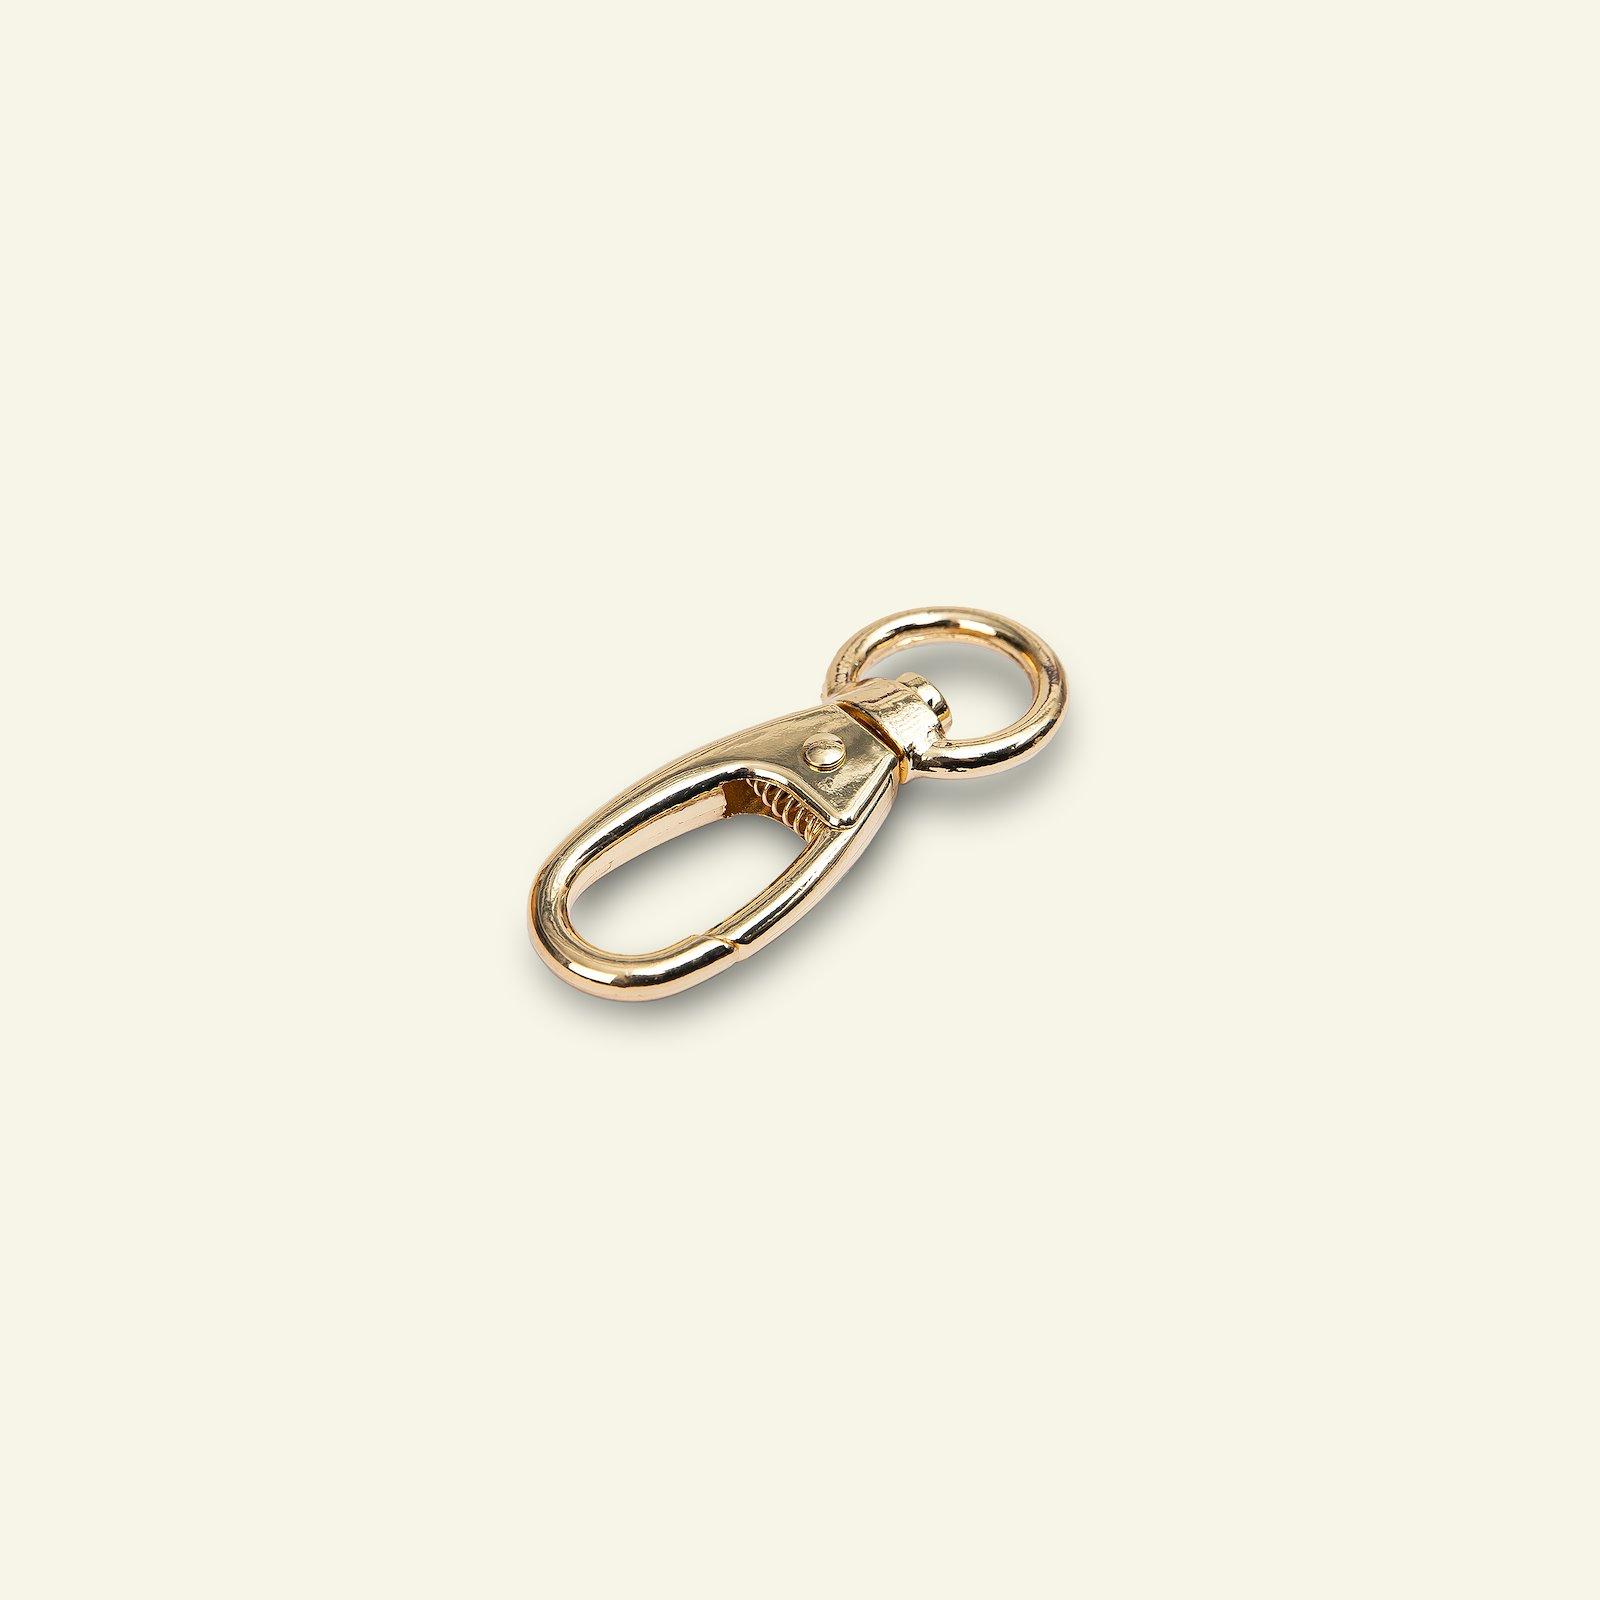 Snap hook metal 62mm gold 1pc 45546_pack